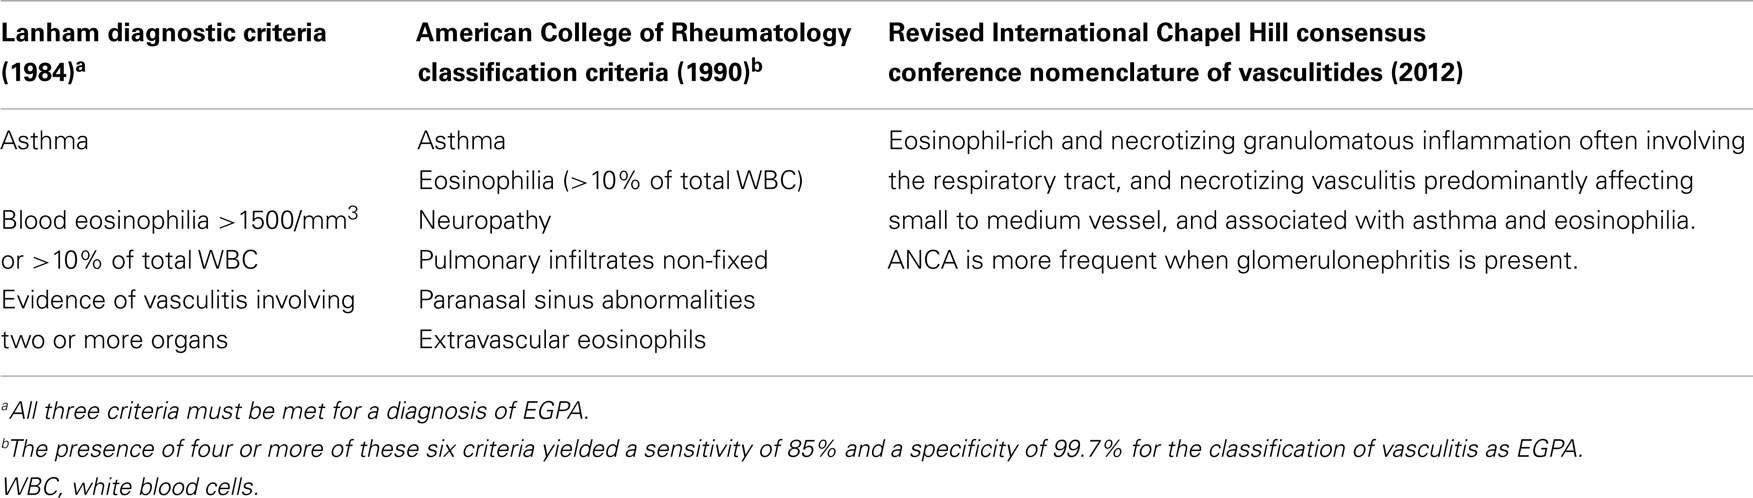 rituximab in steroid refractory autoimmune hemolytic anemia